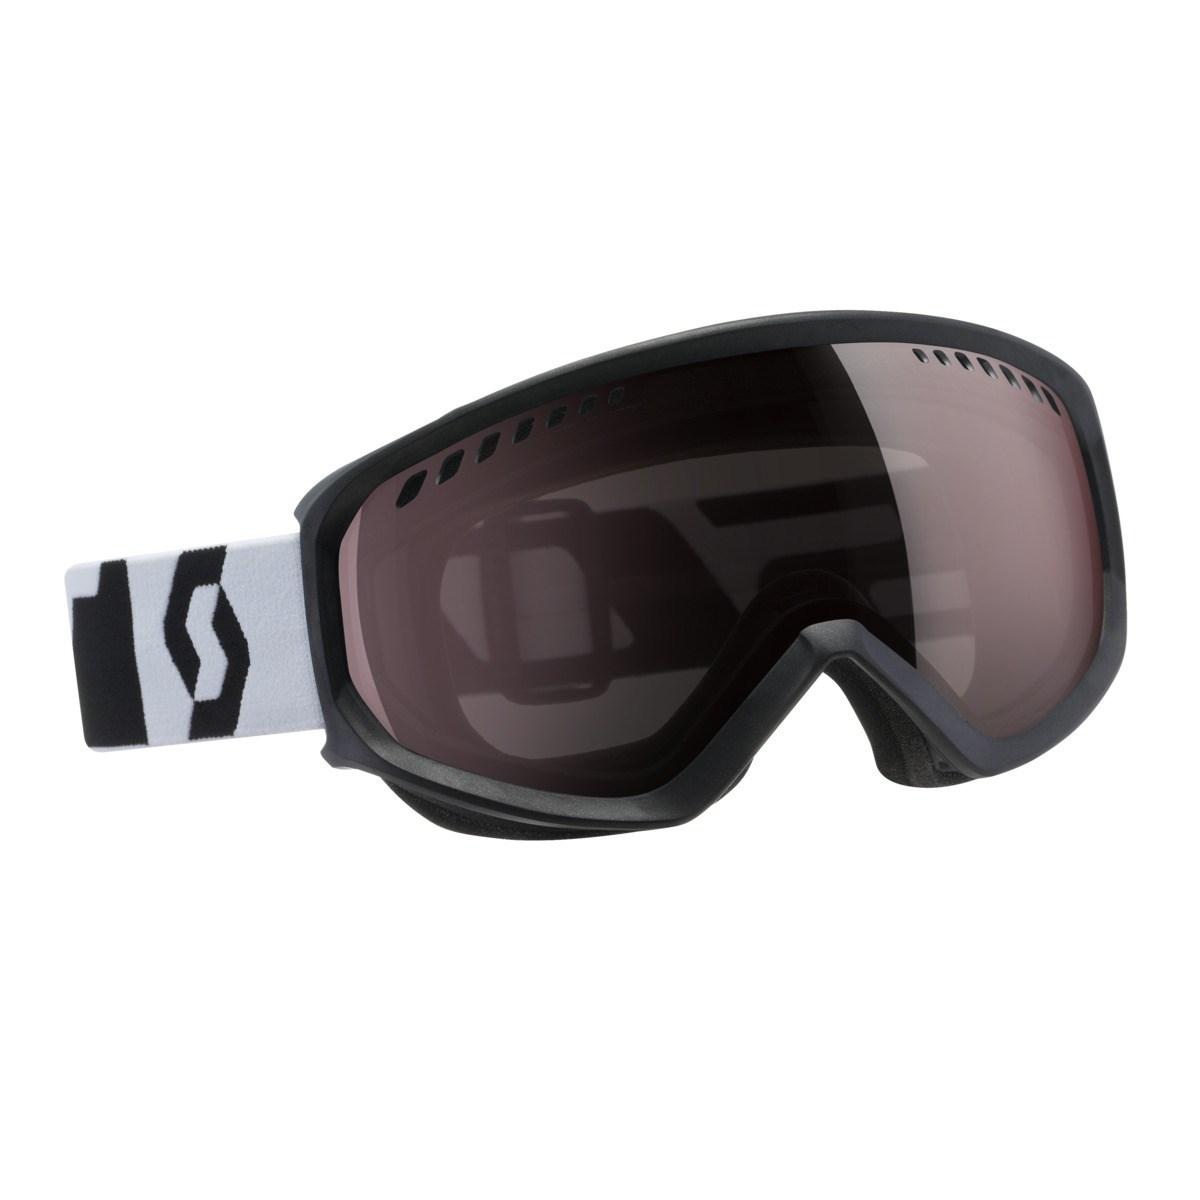 36d504e7d5e0 Scott Faze Ski Goggles Black White/Amplifier Silver Chrome. 0 (Be the first  to add a review!)